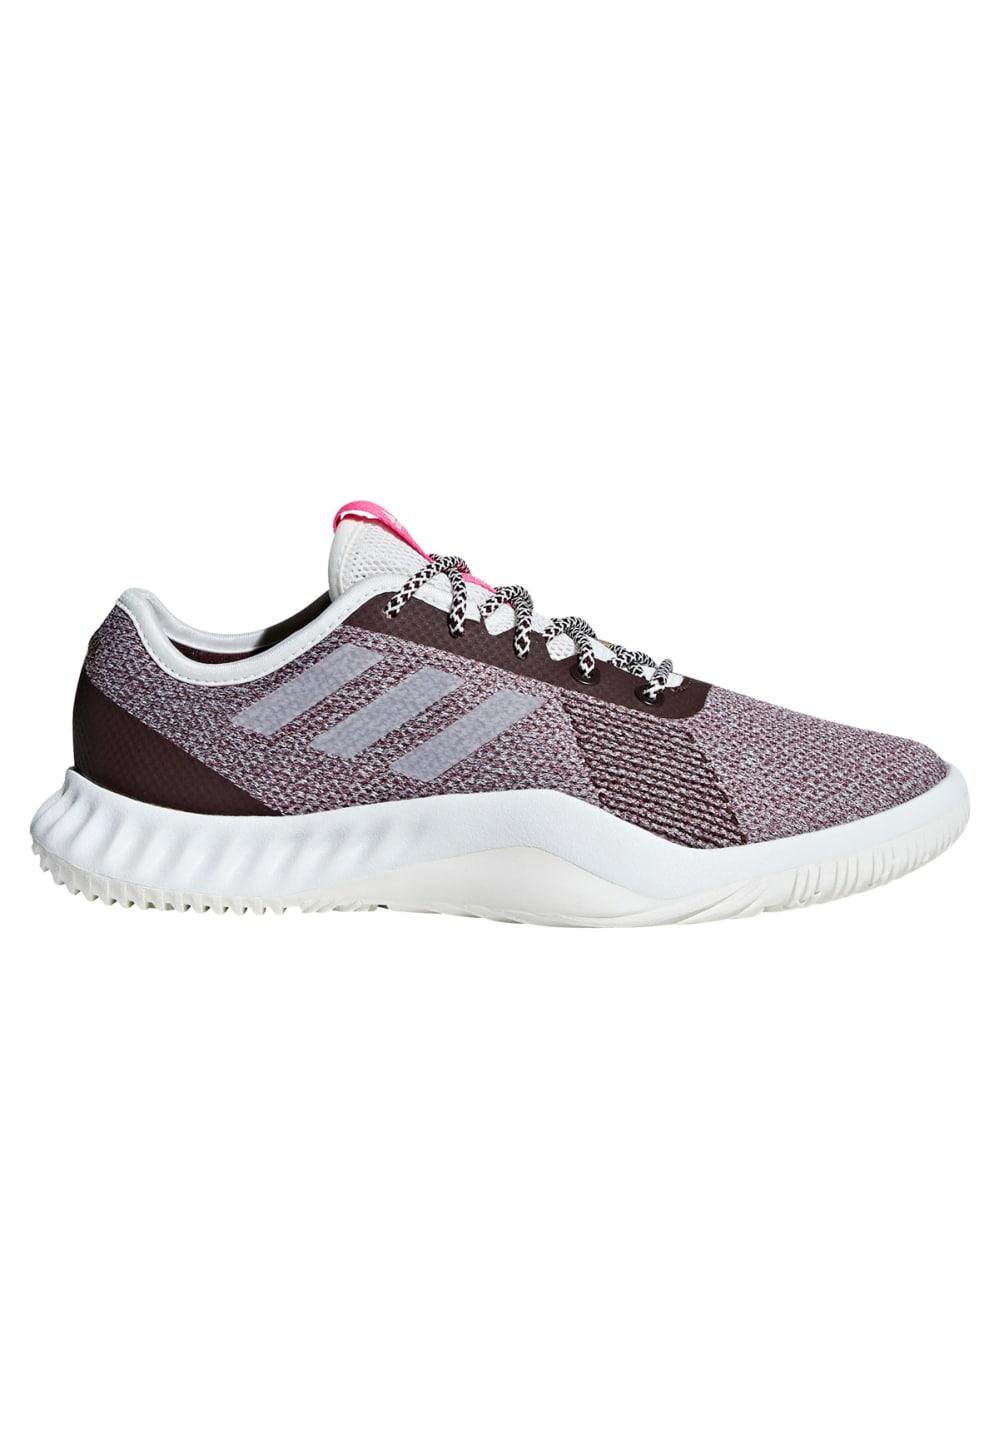 adidas Crazytrain LT - Fitnessschuhe für Damen - Lila | 21RUN